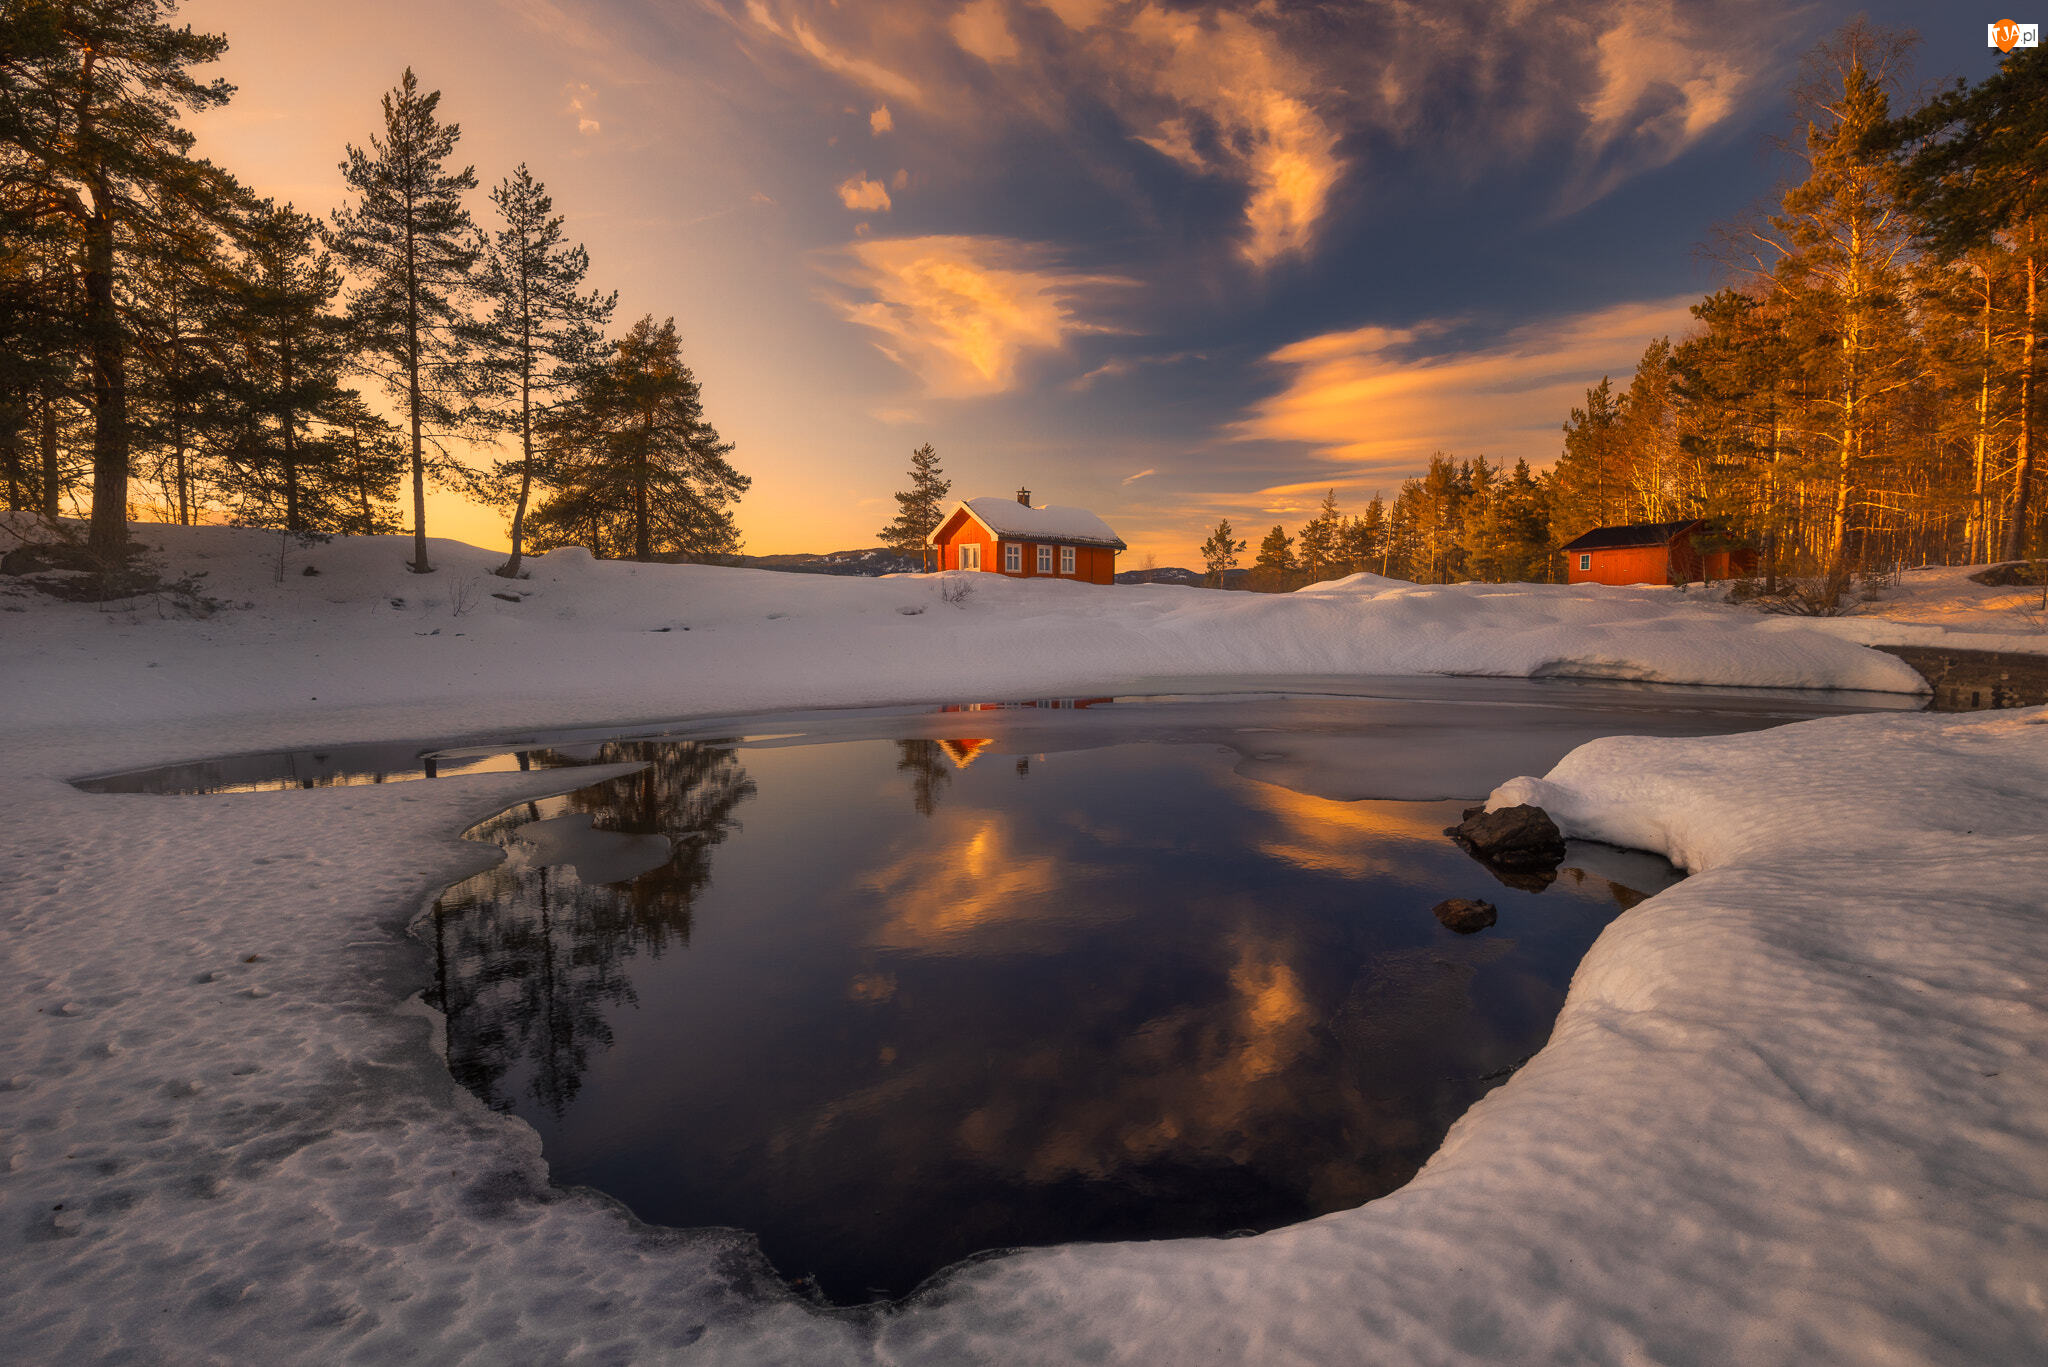 Jezioro Vaeleren, Domy, Norwegia, Ringerike, Zima, Zachód słońca, Drzewa